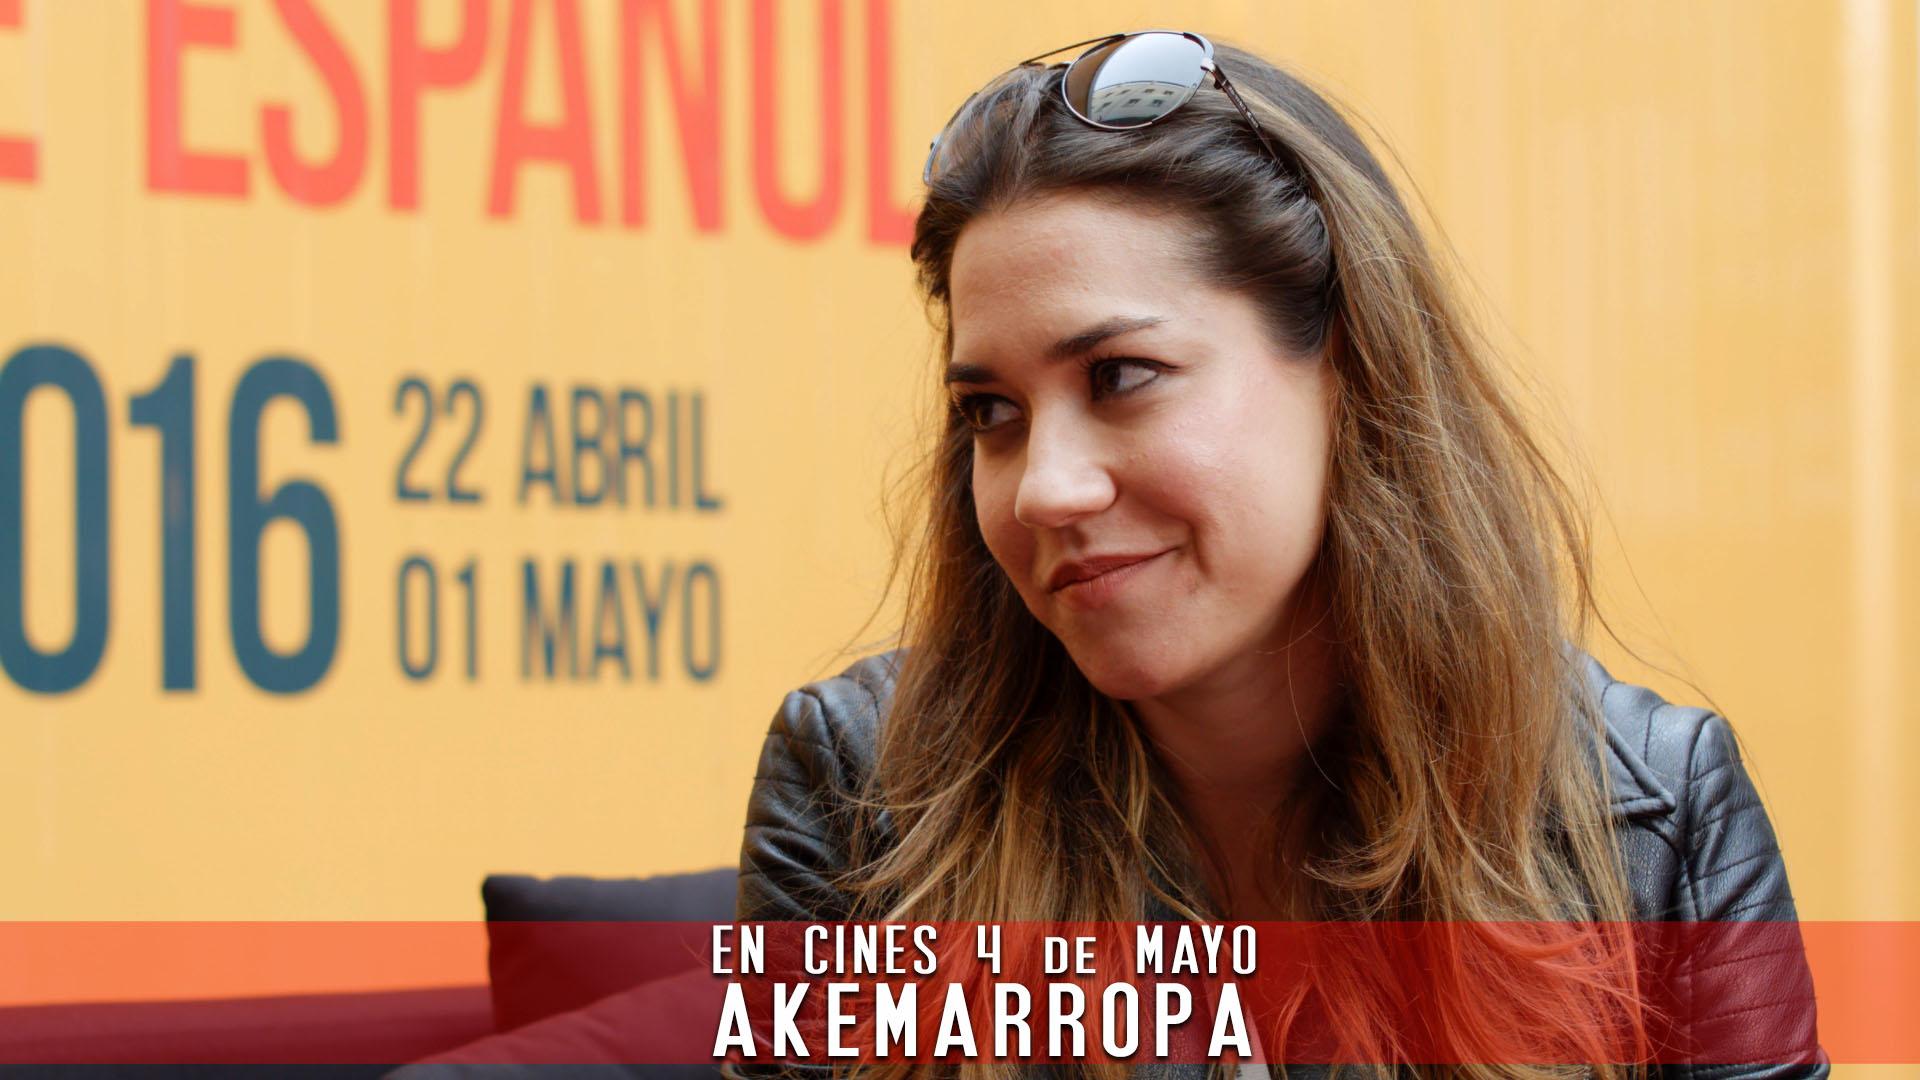 Elena Martinez Akemarropa Protagonista